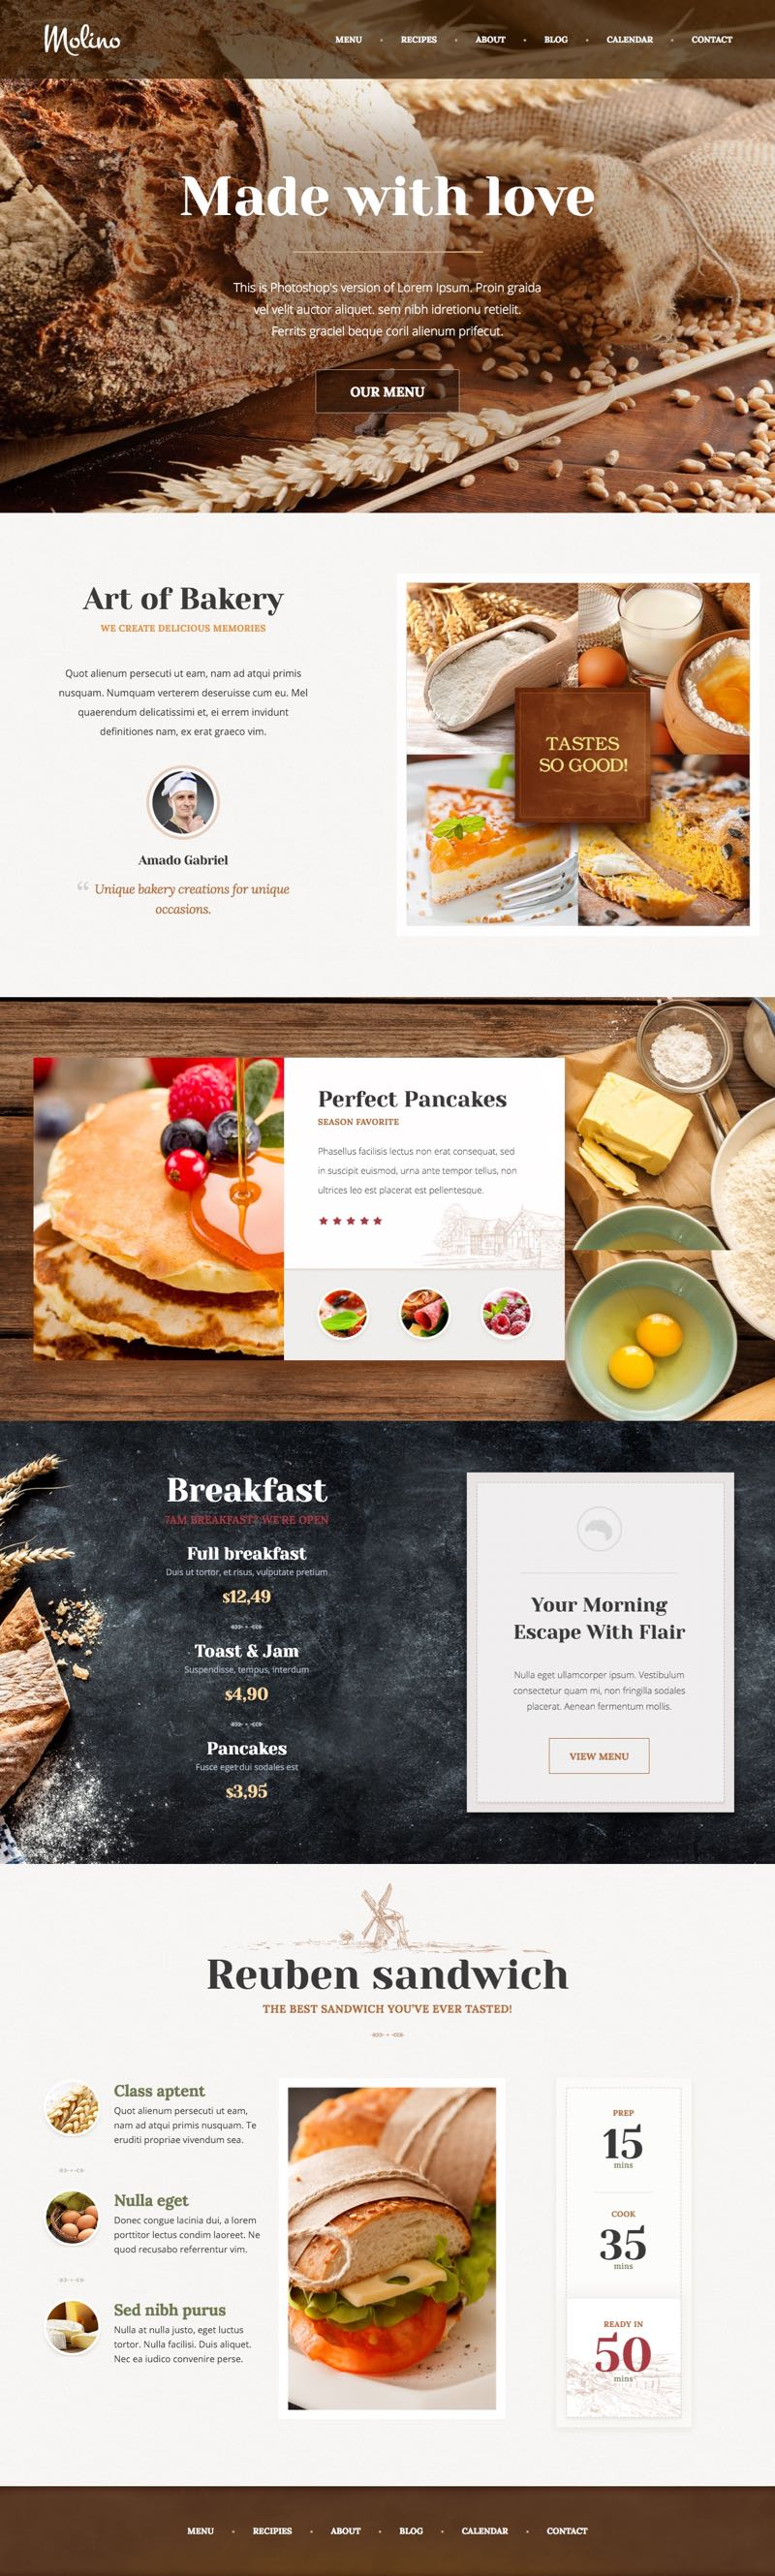 Molino WordPress Bakery Theme